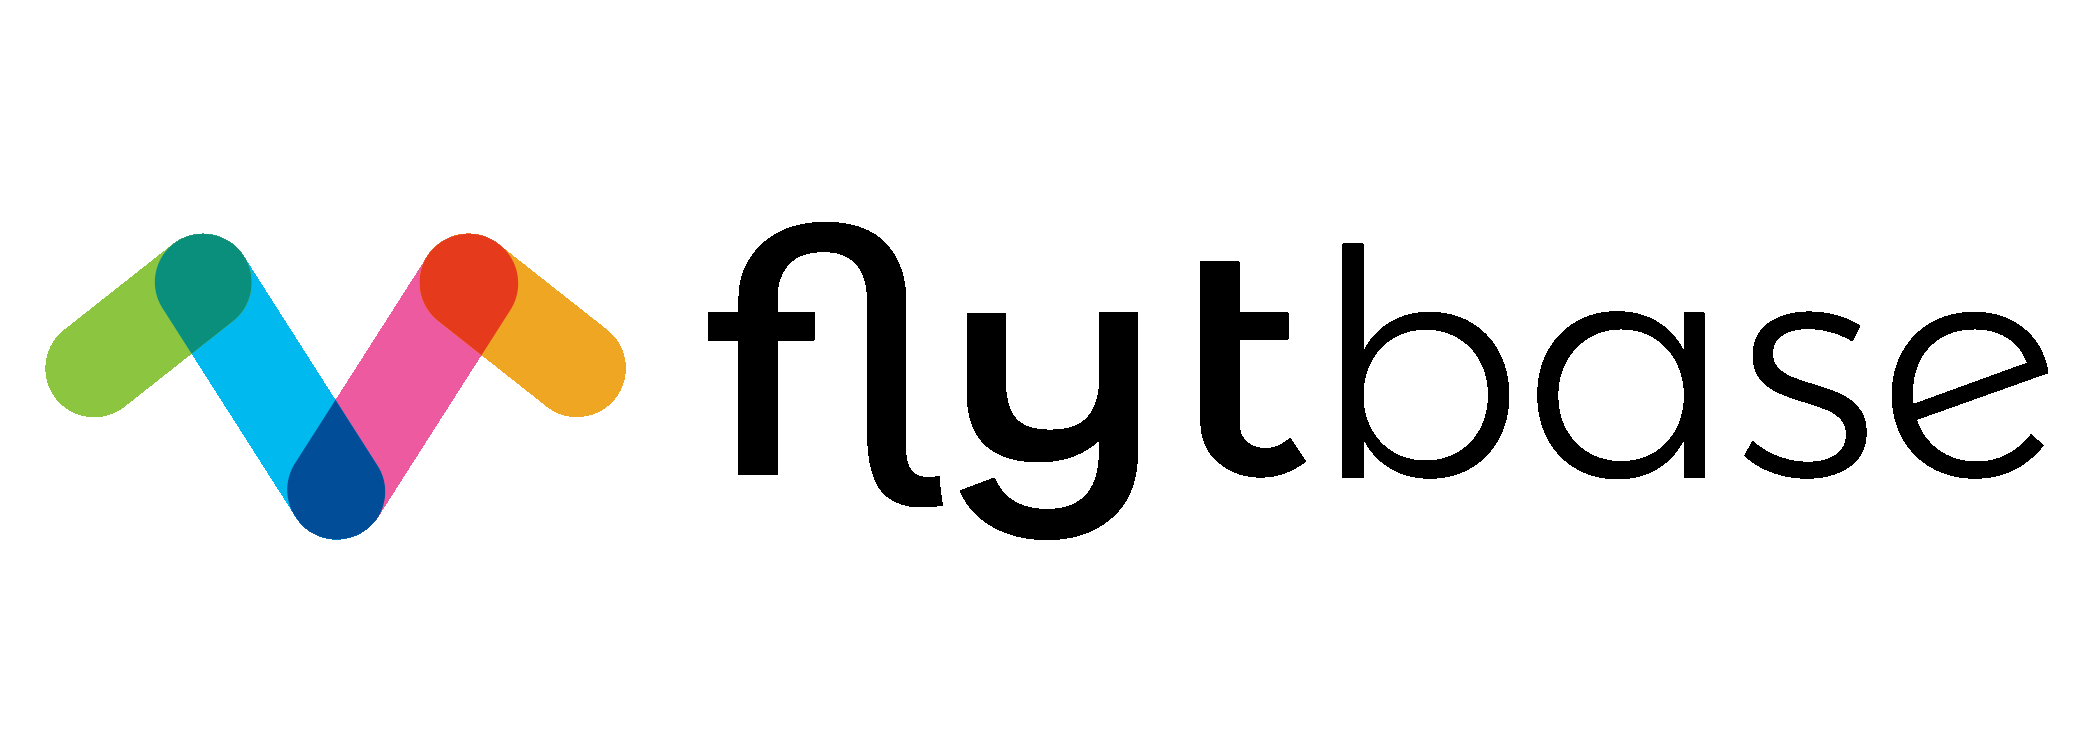 flytbase (2).png